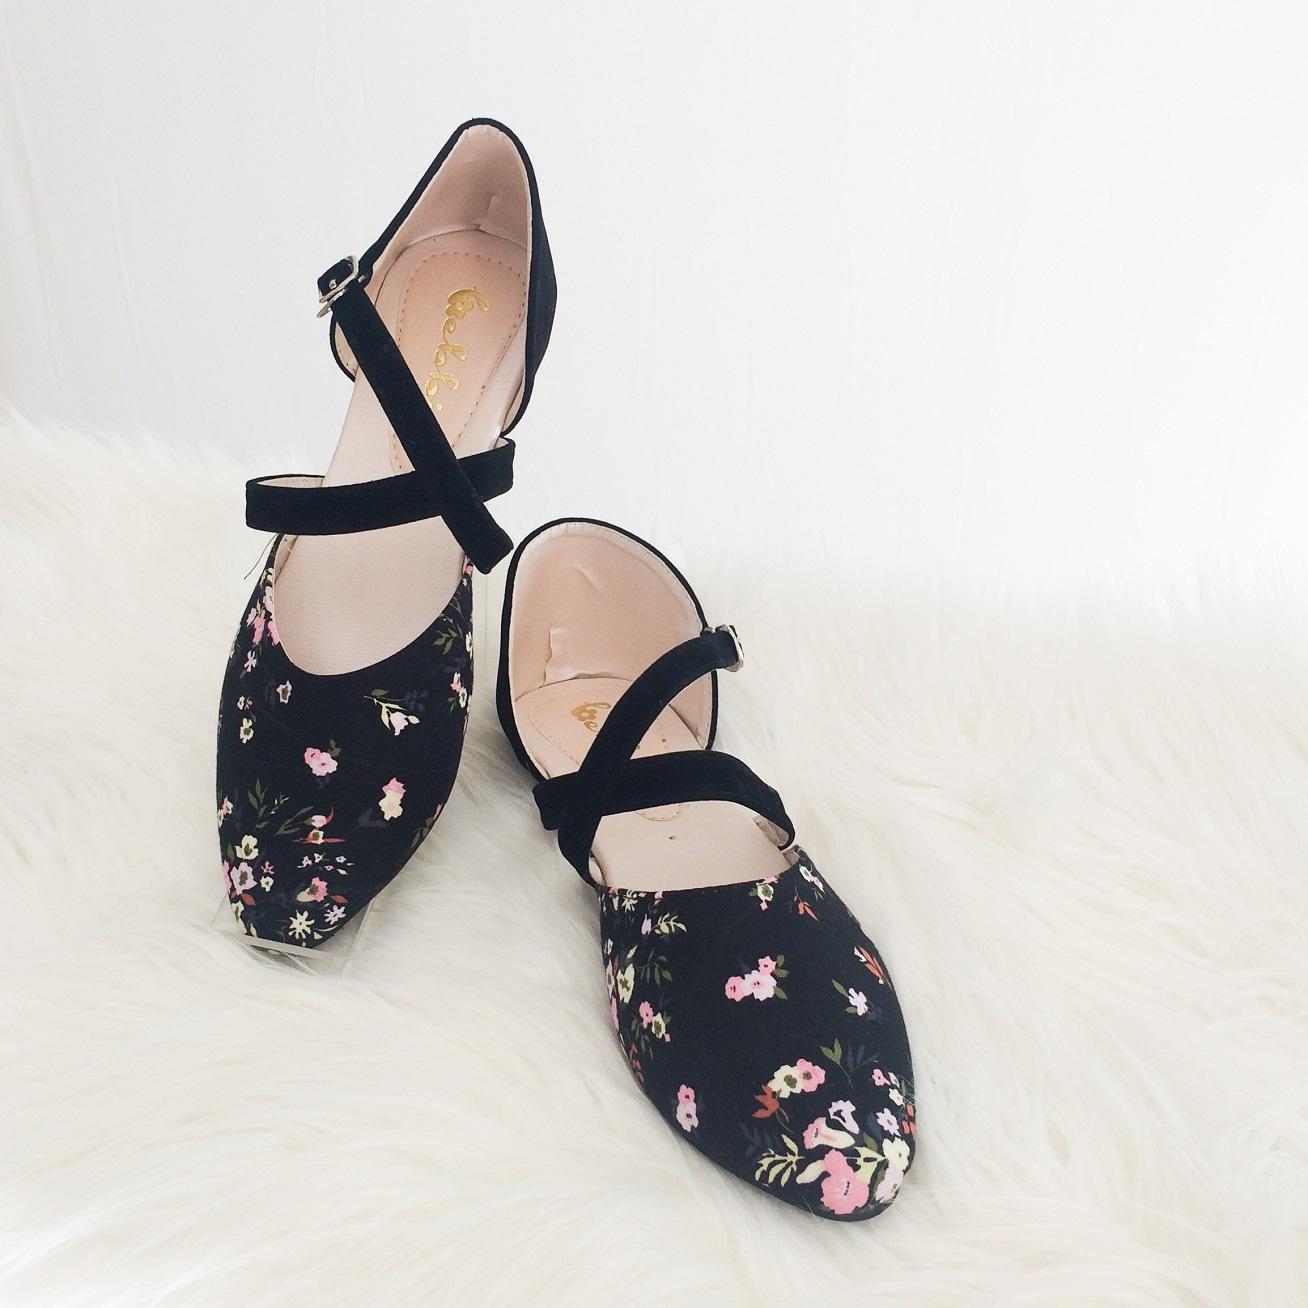 Bebbishoes-Vale Flatshoes-Black